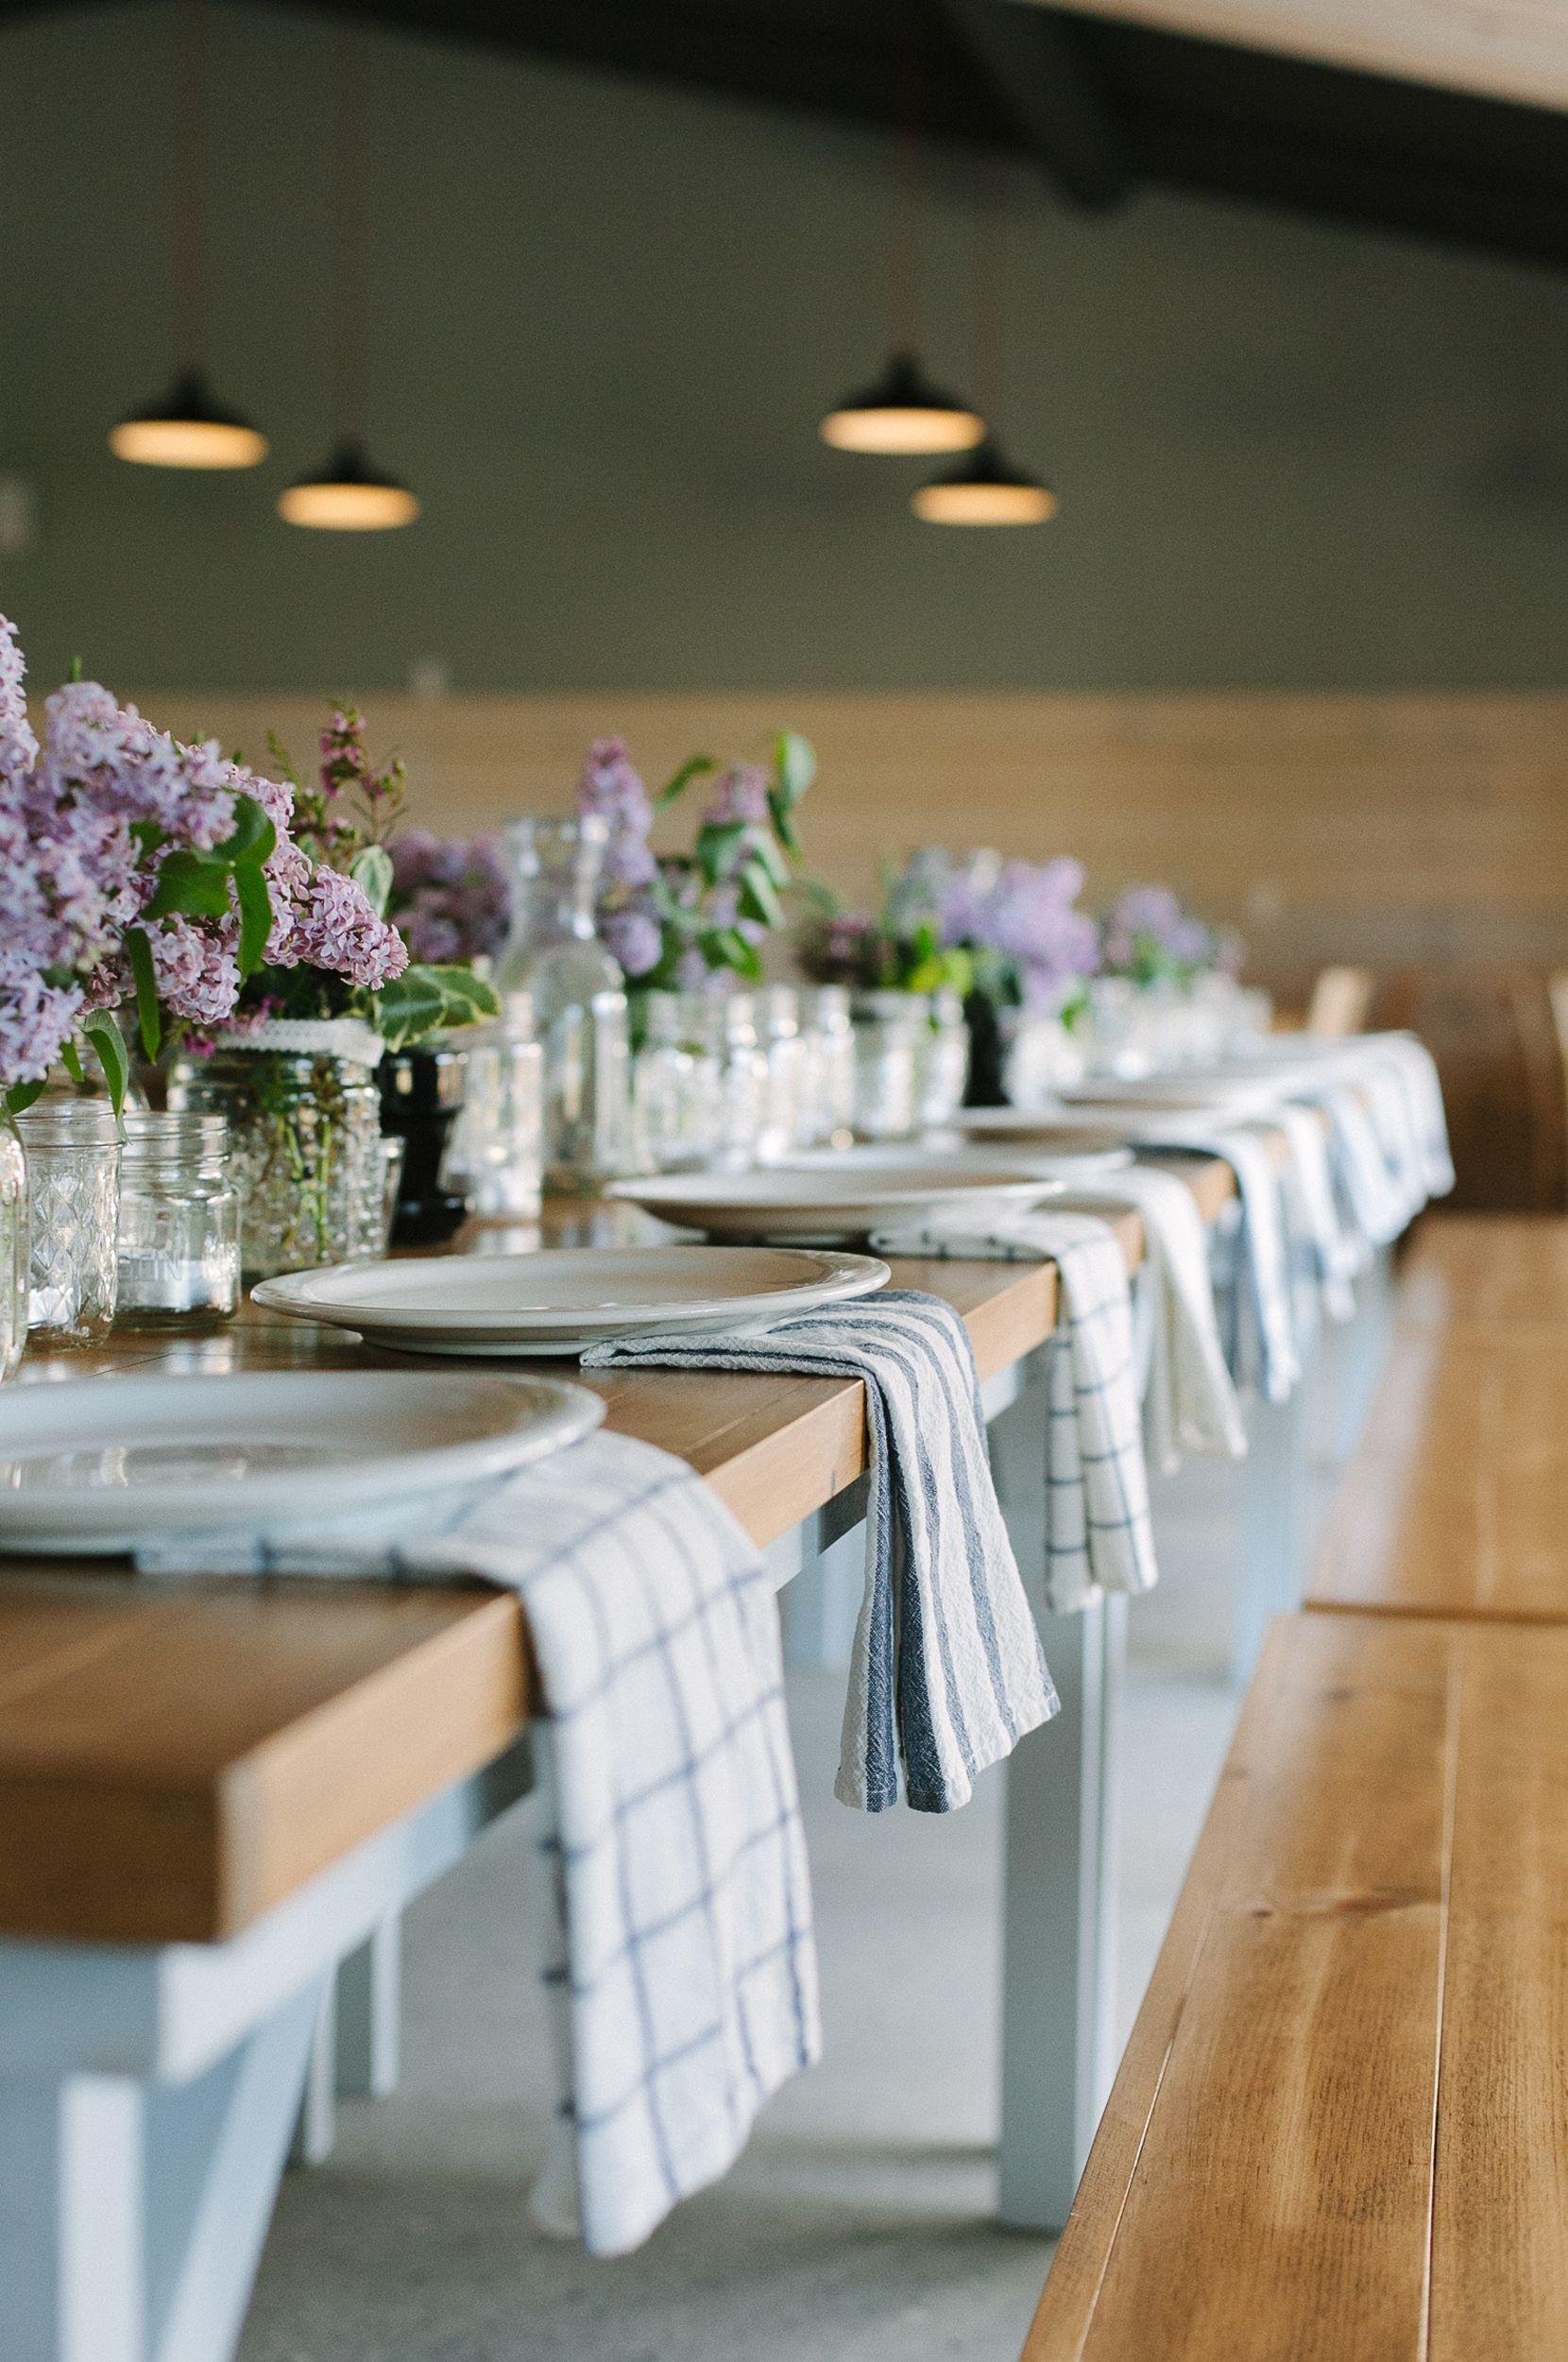 lilacs | Simple Evening: The Little Fleet  |  The Fresh Exchange